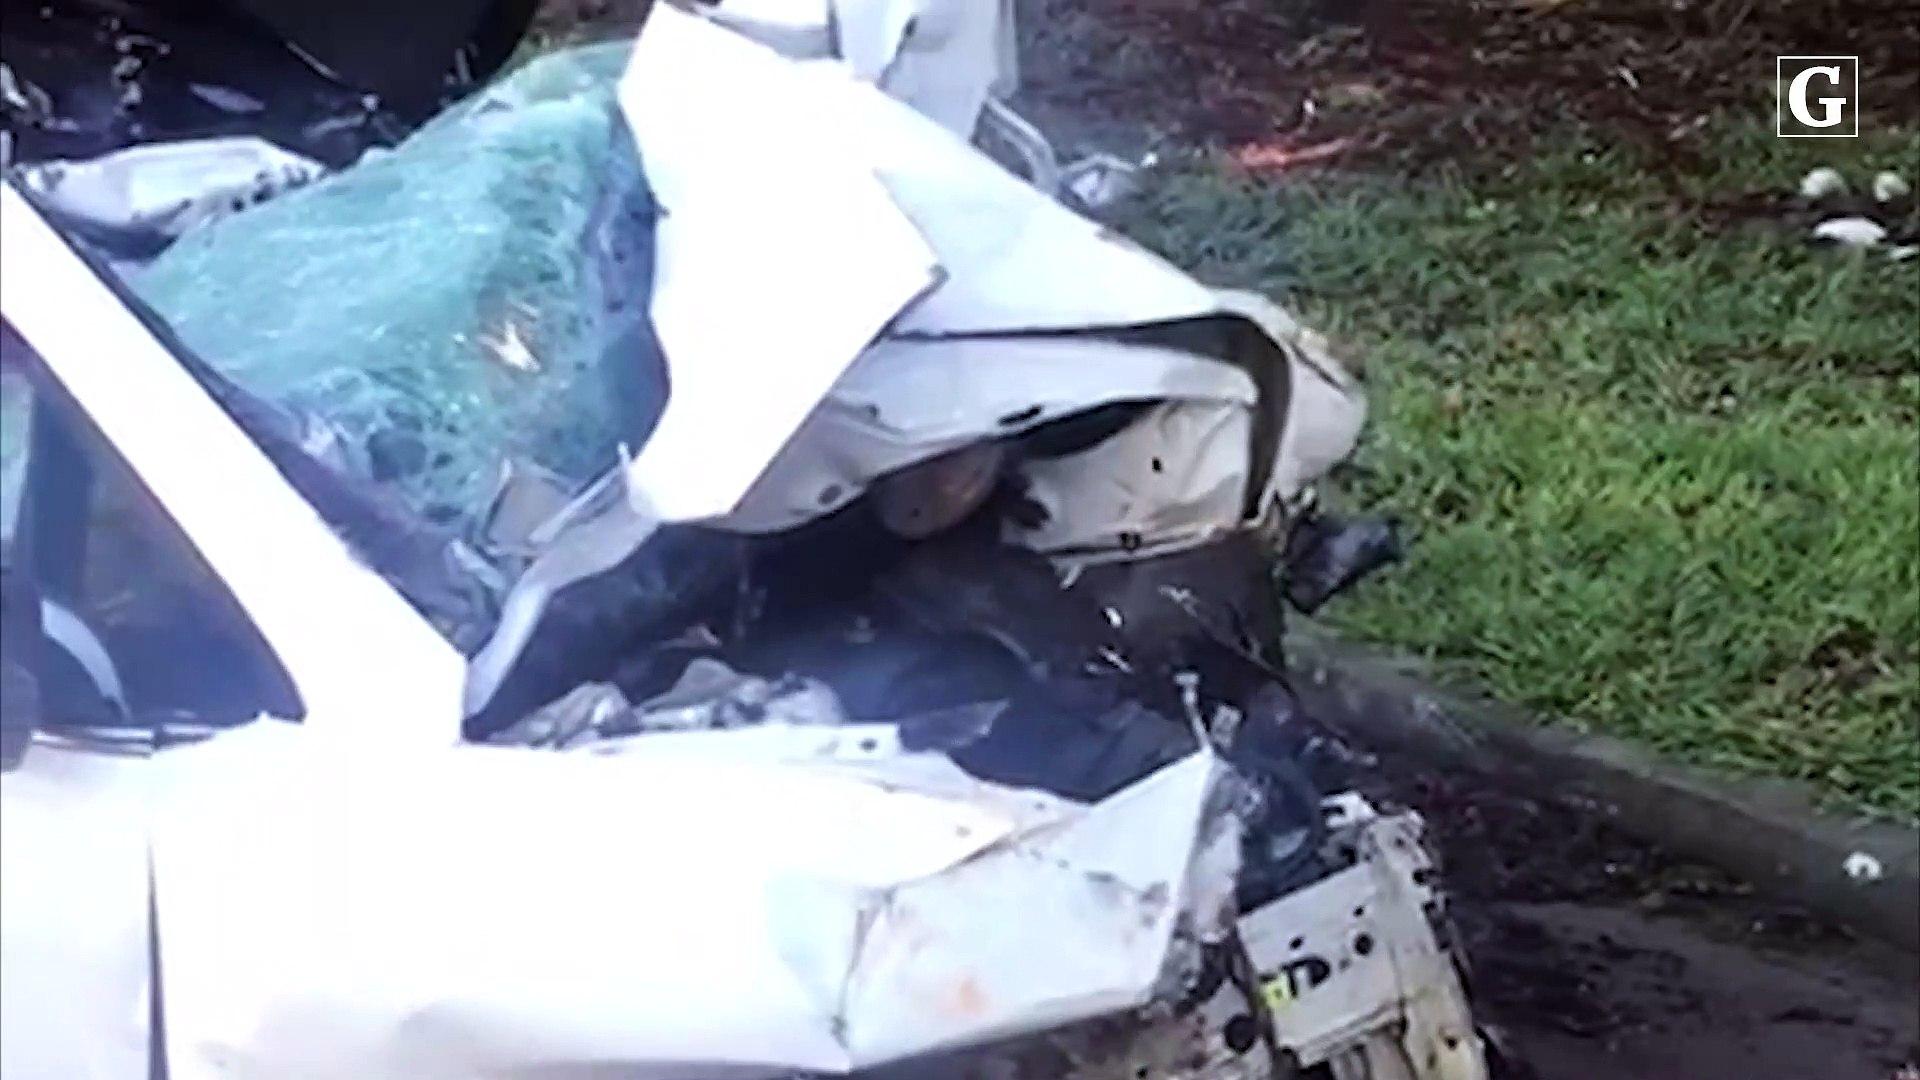 BR 101: bloco de granito cai sobre carro e mata família no ES